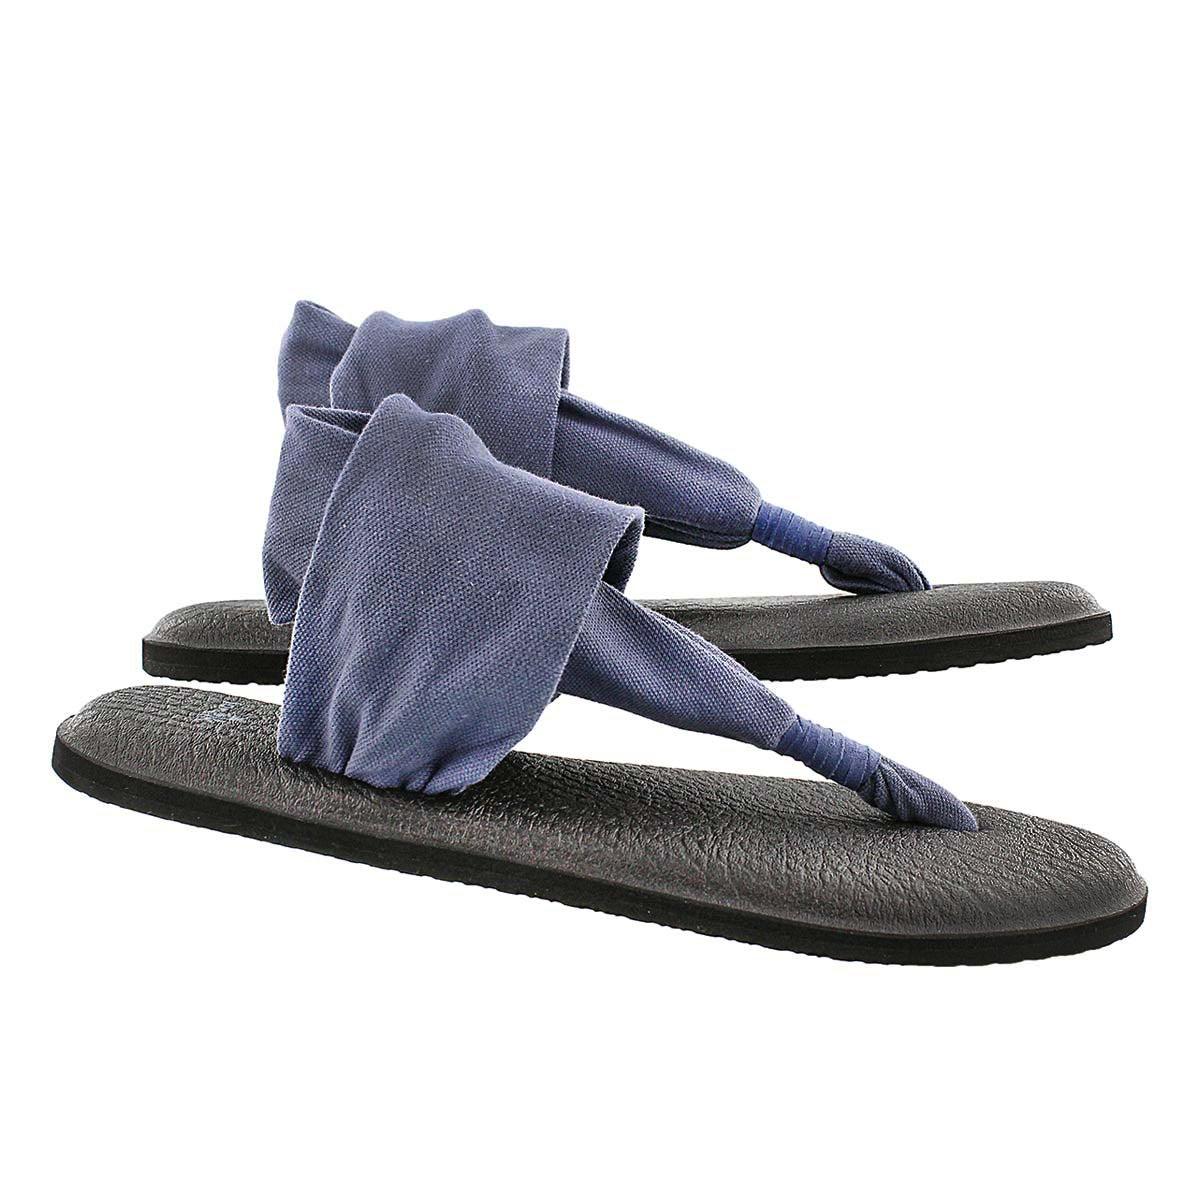 Lds Yoga Sling slate blue thong sandal